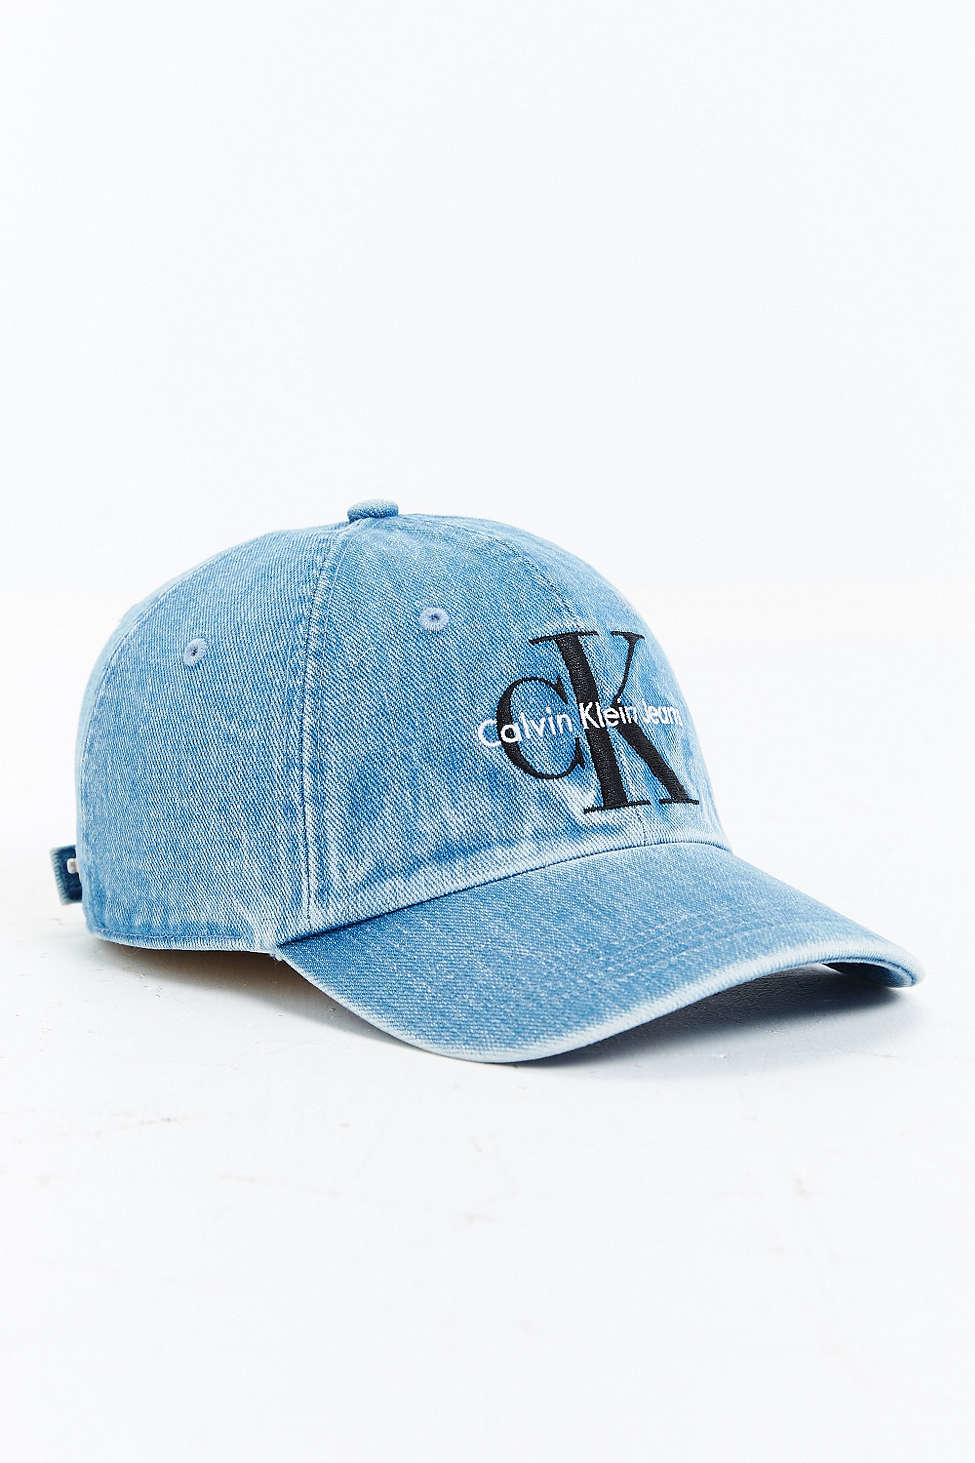 calvin klein baseball denim cap in blue for men lyst. Black Bedroom Furniture Sets. Home Design Ideas